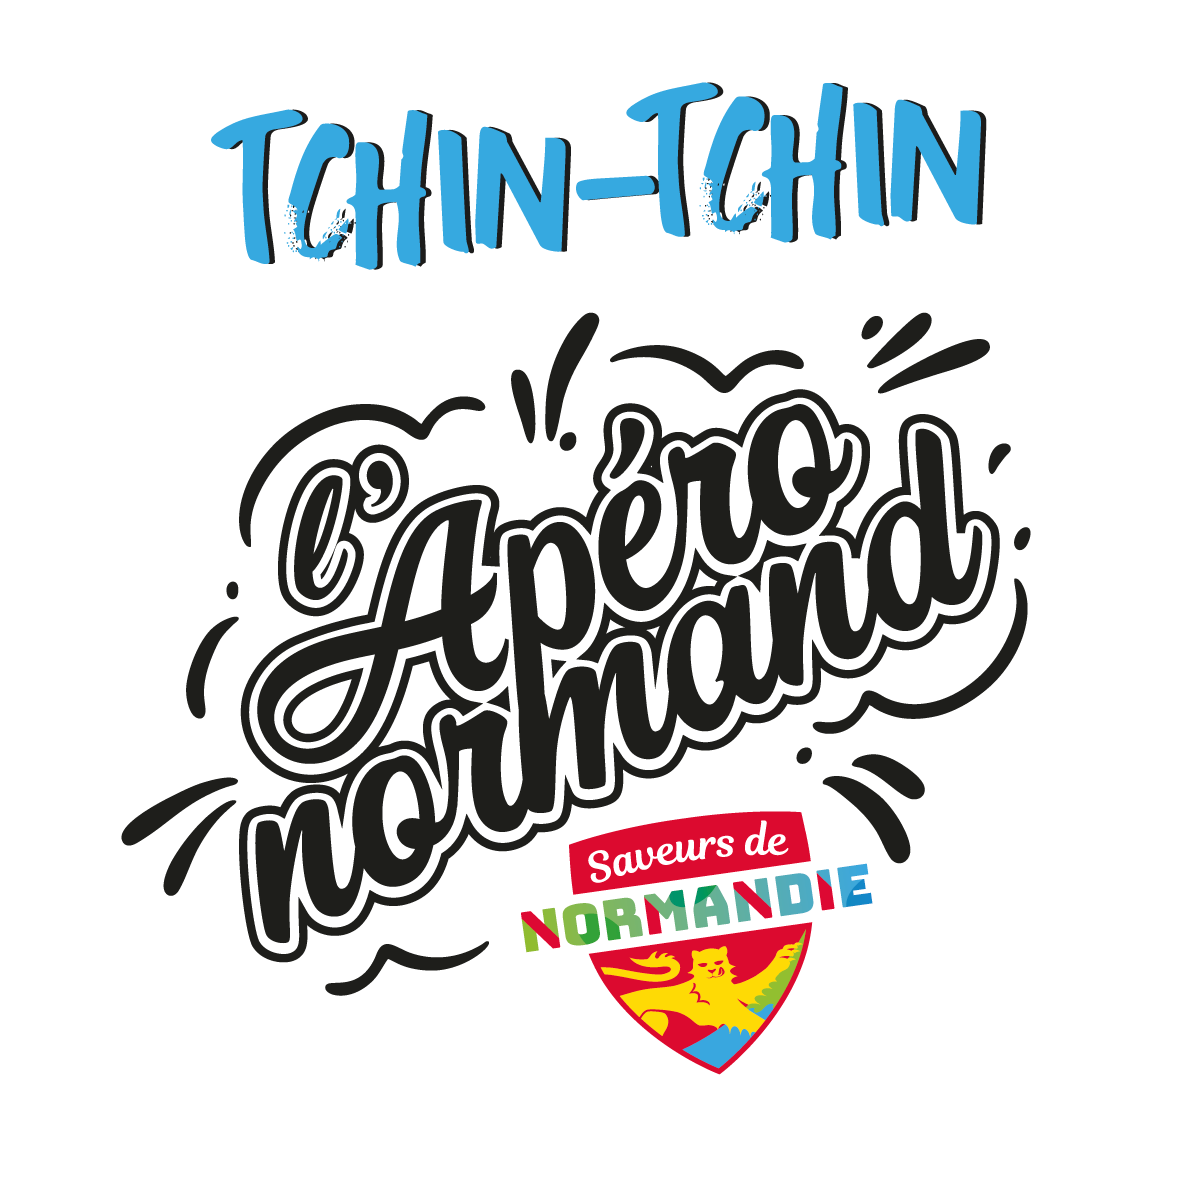 Tchin Tchin Apéro Normand